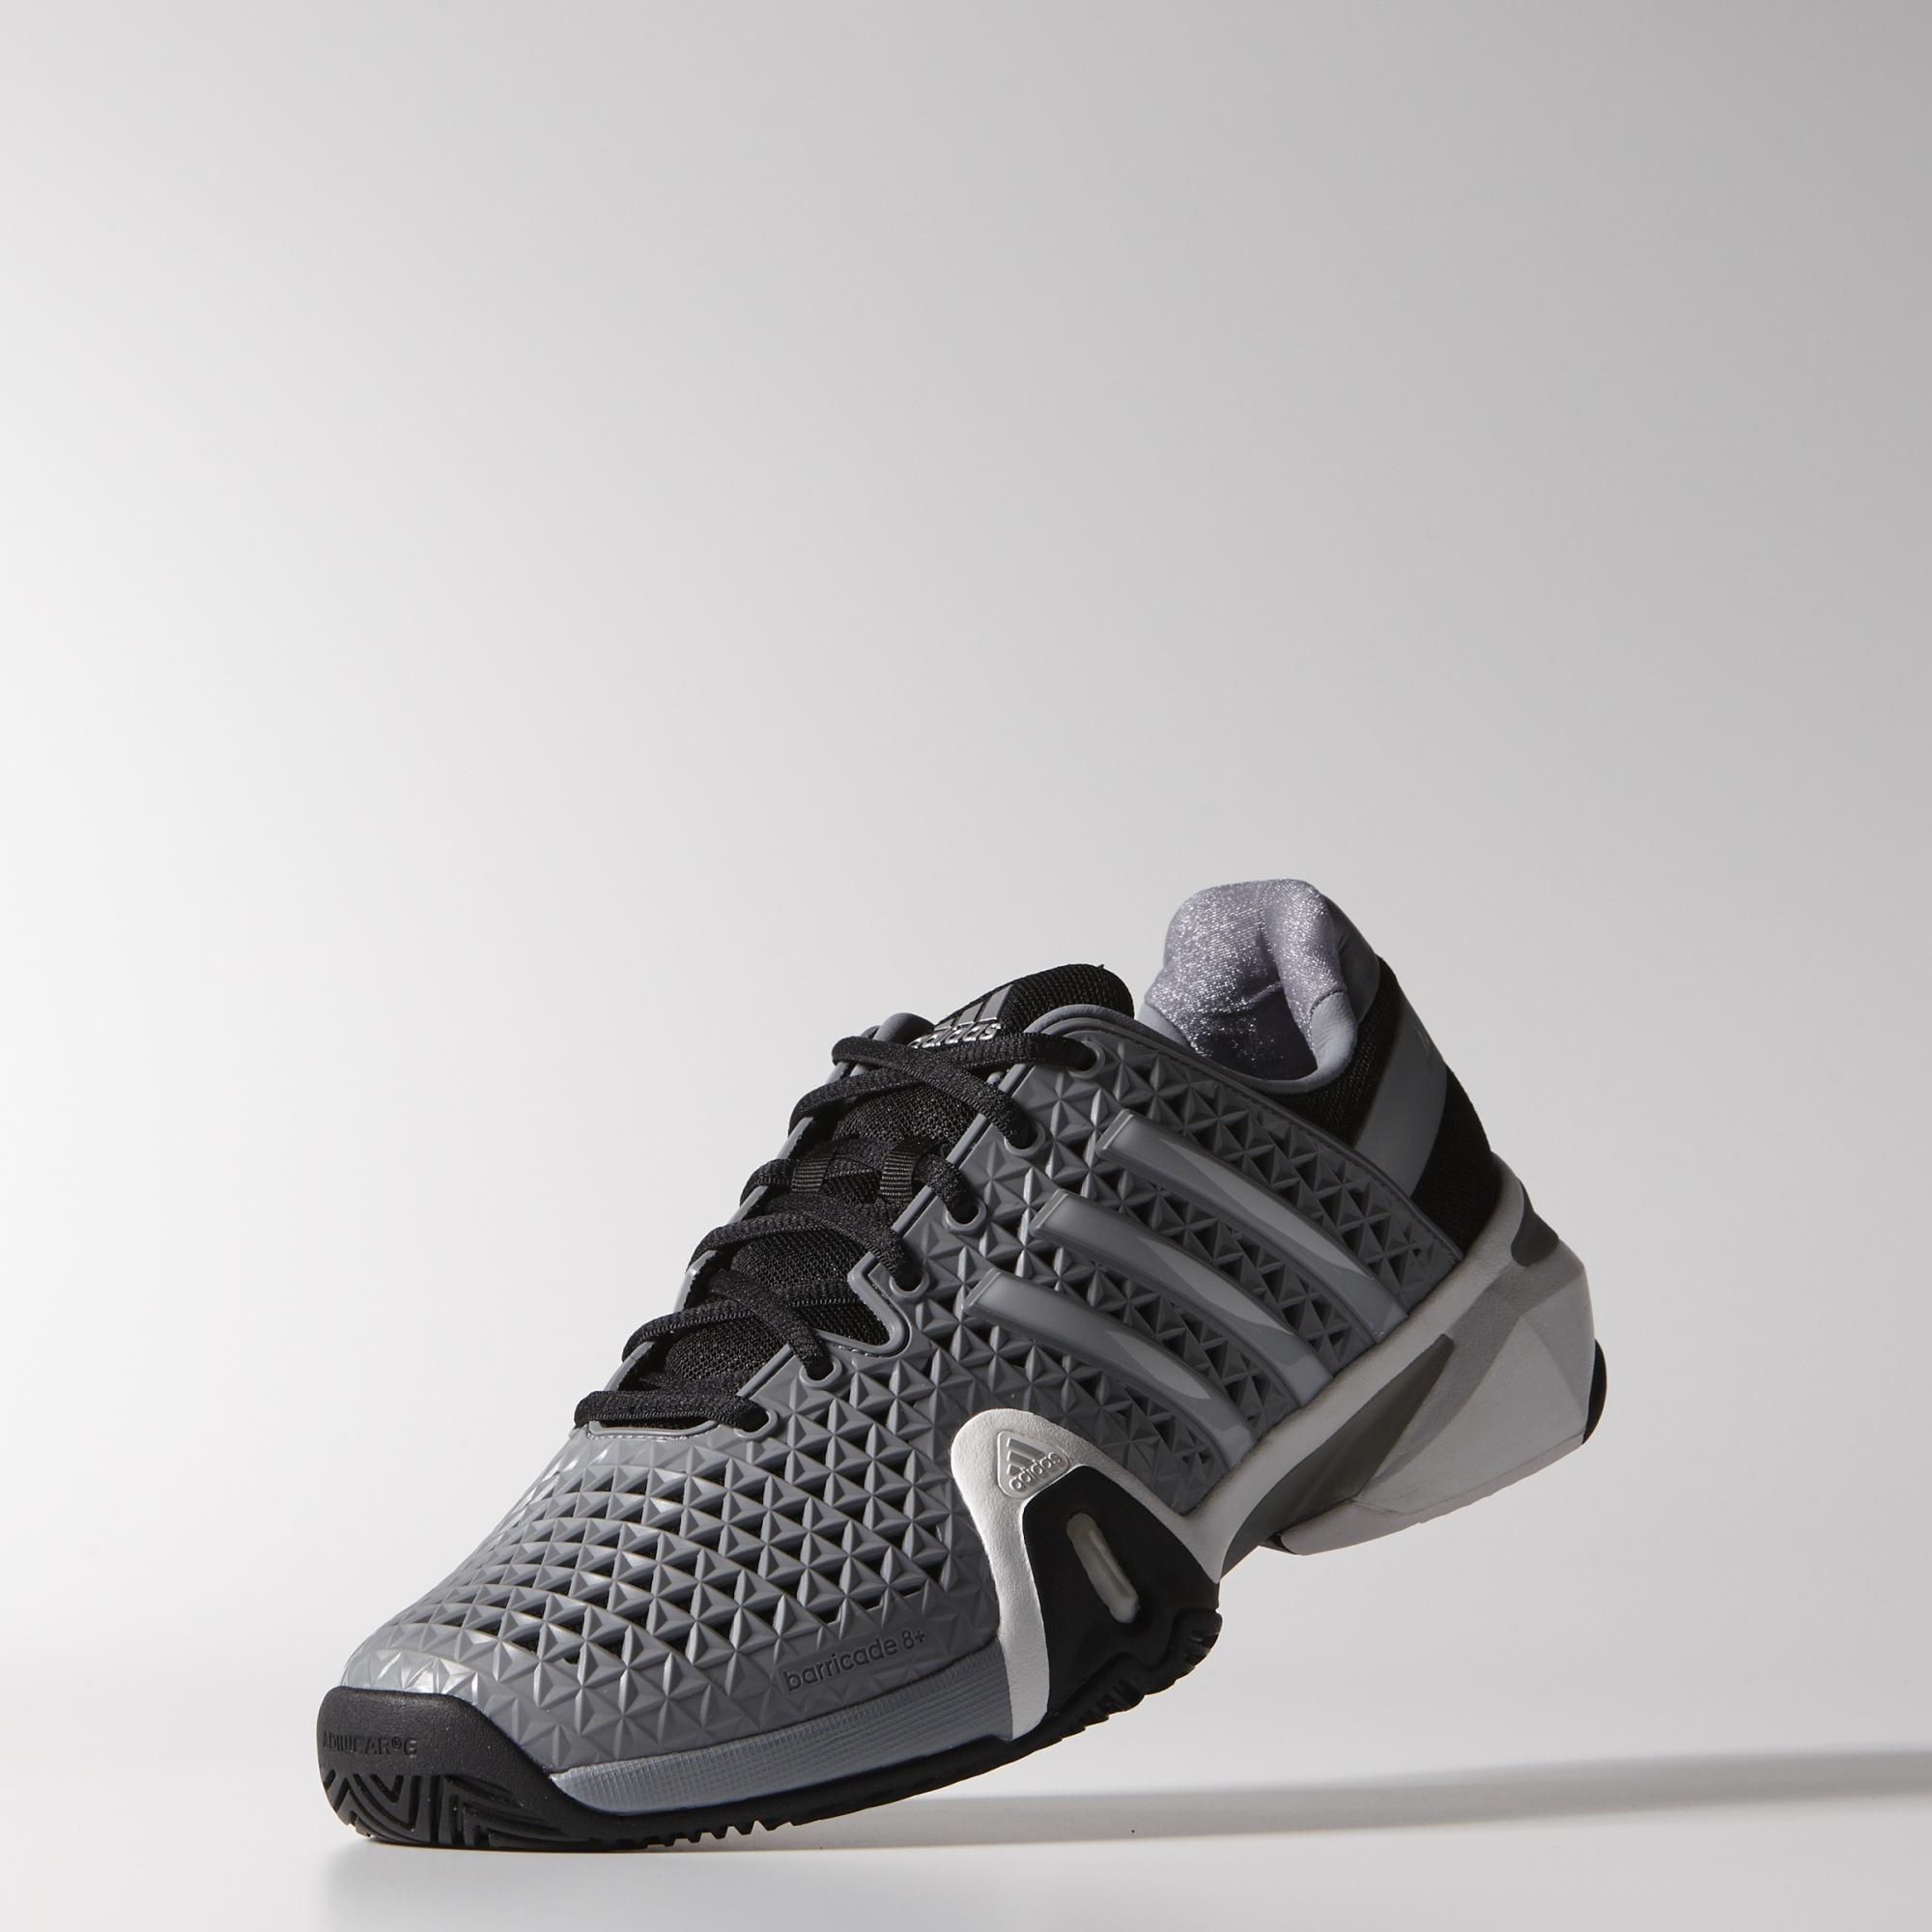 2017 adidas eqt racing 93 scarpe talc adidas italia talc